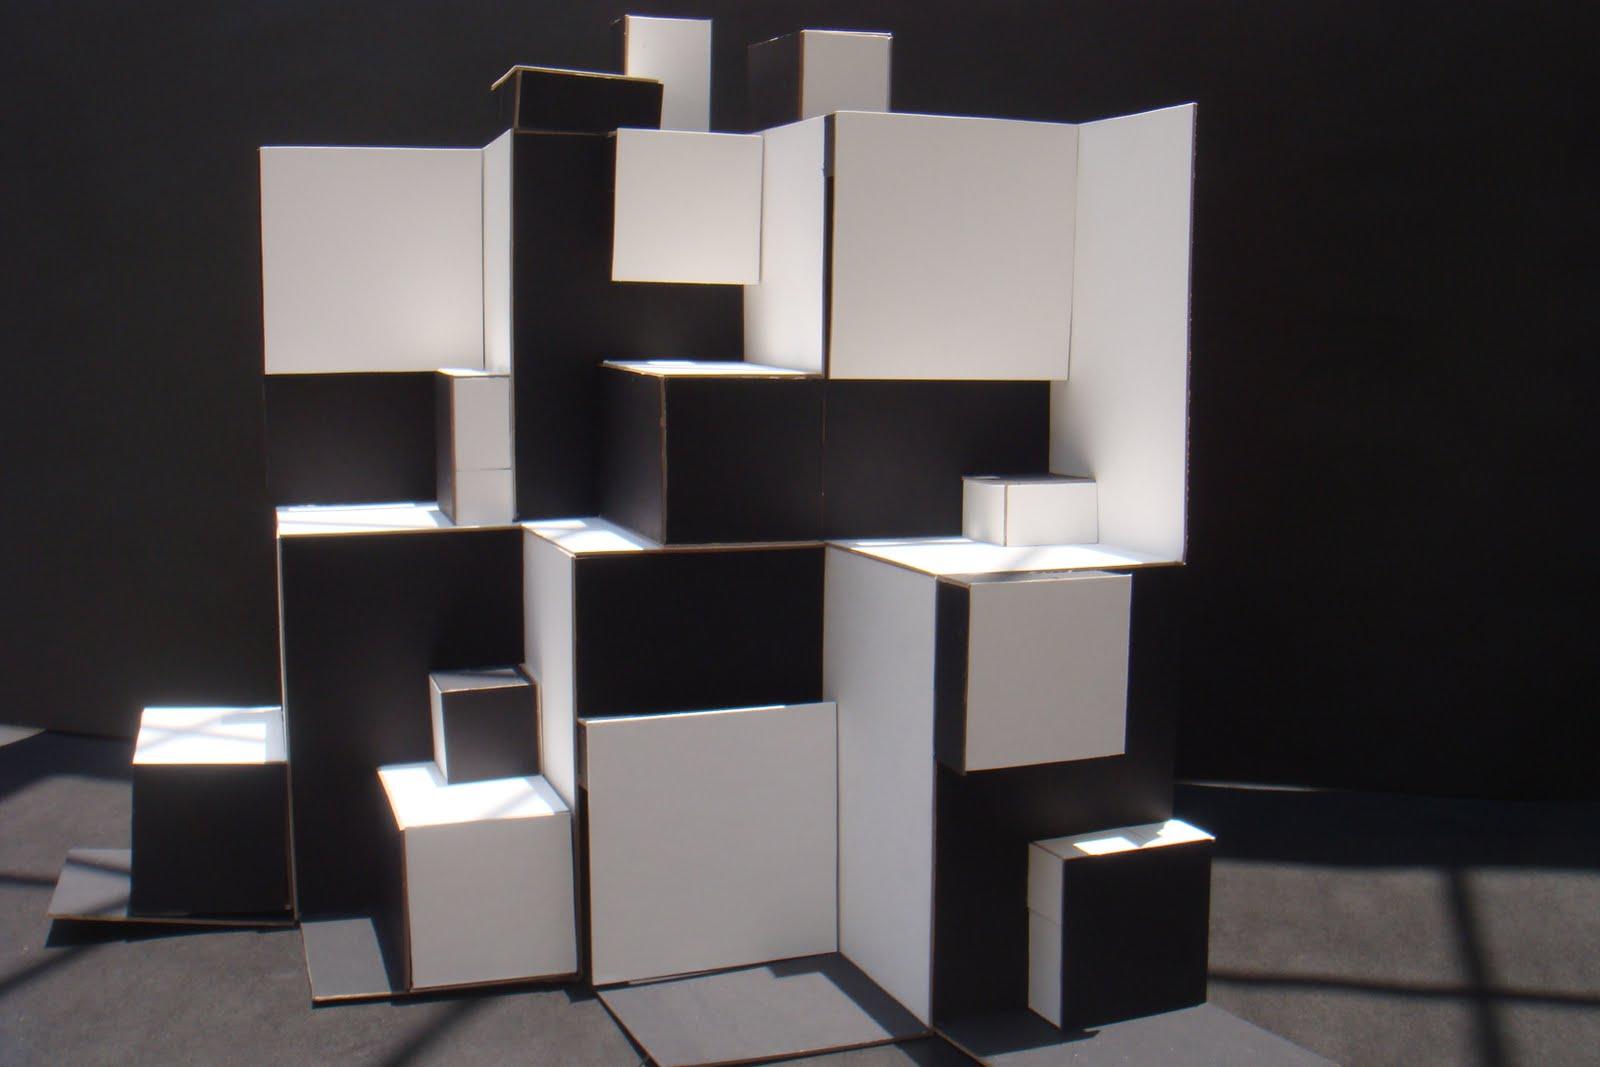 Fundamentos de dise o i proporcion for Generando diseno muebles